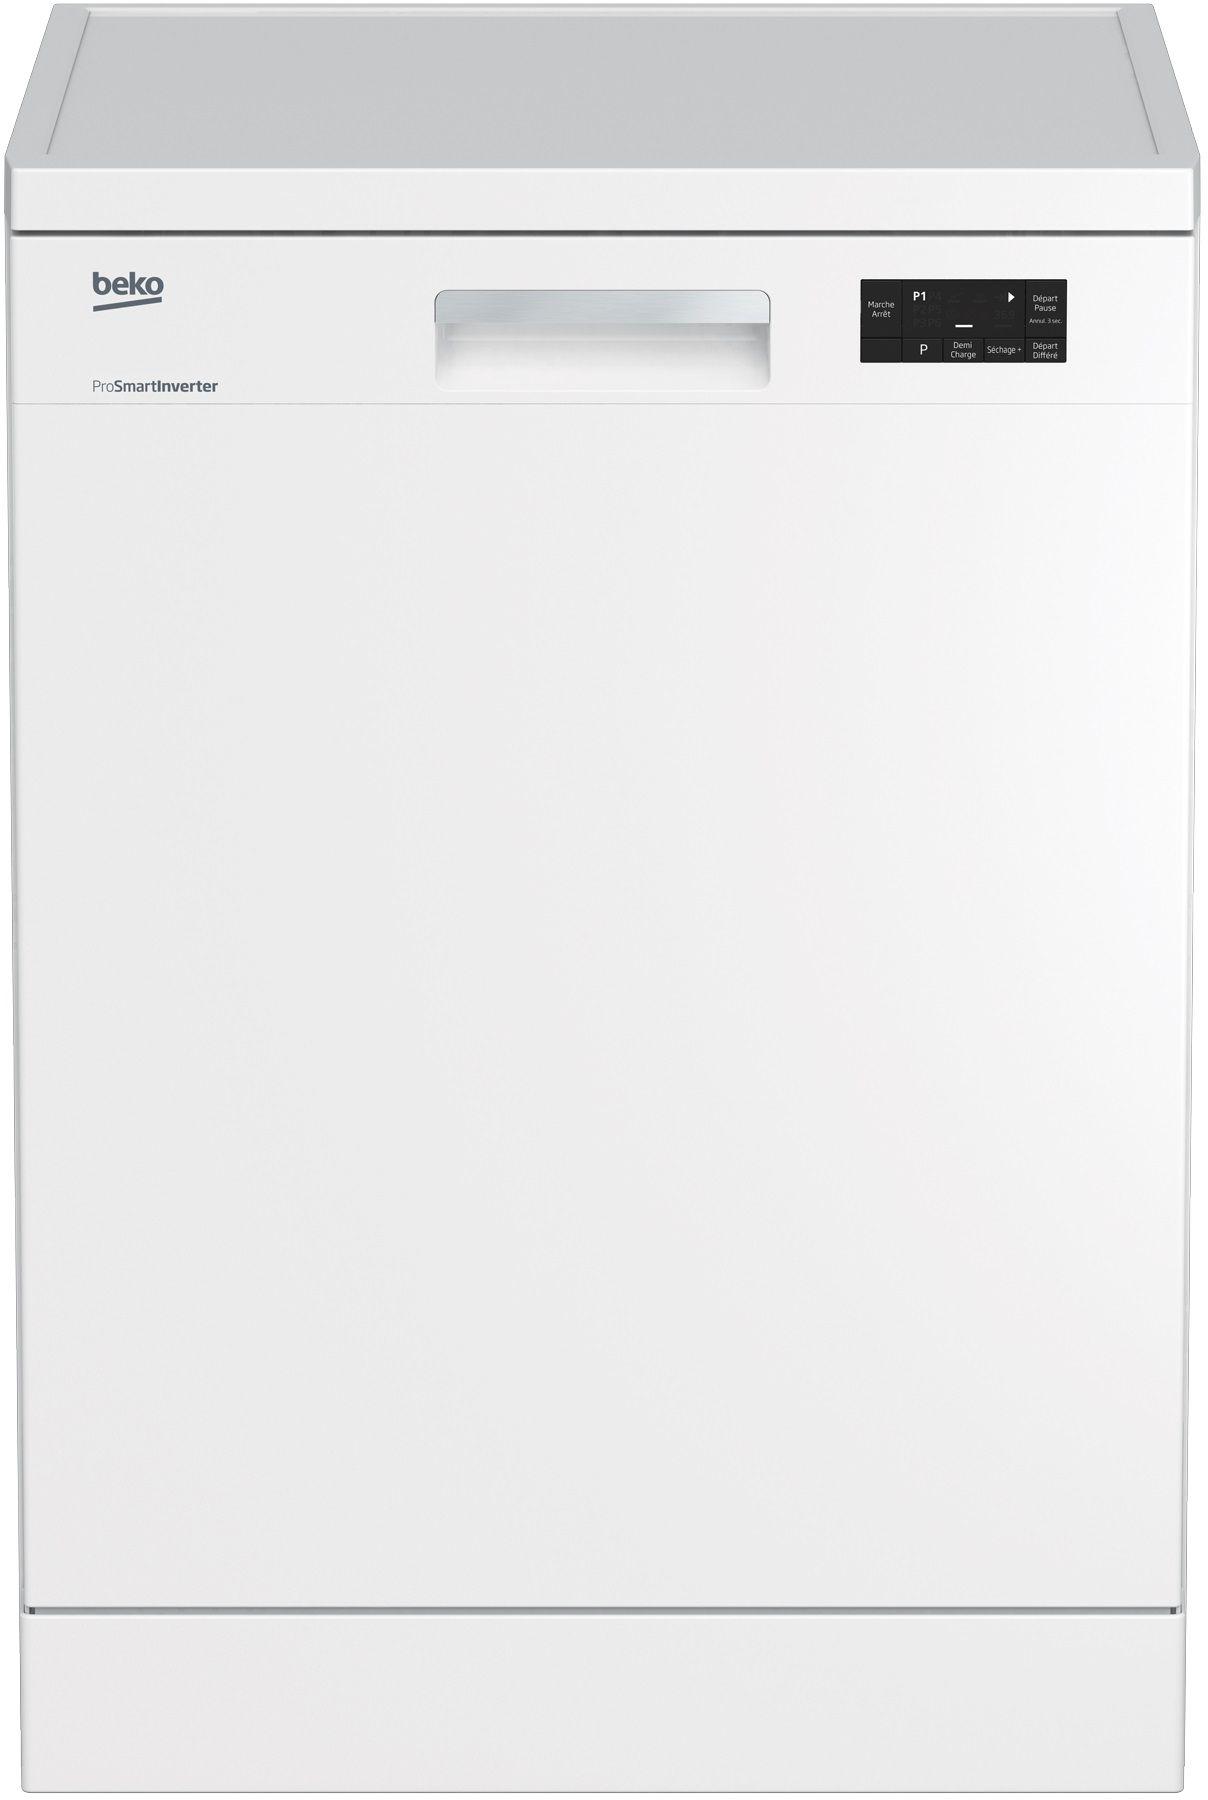 forum beko crdfn16330w reinitialiser crdfn16330w beko. Black Bedroom Furniture Sets. Home Design Ideas